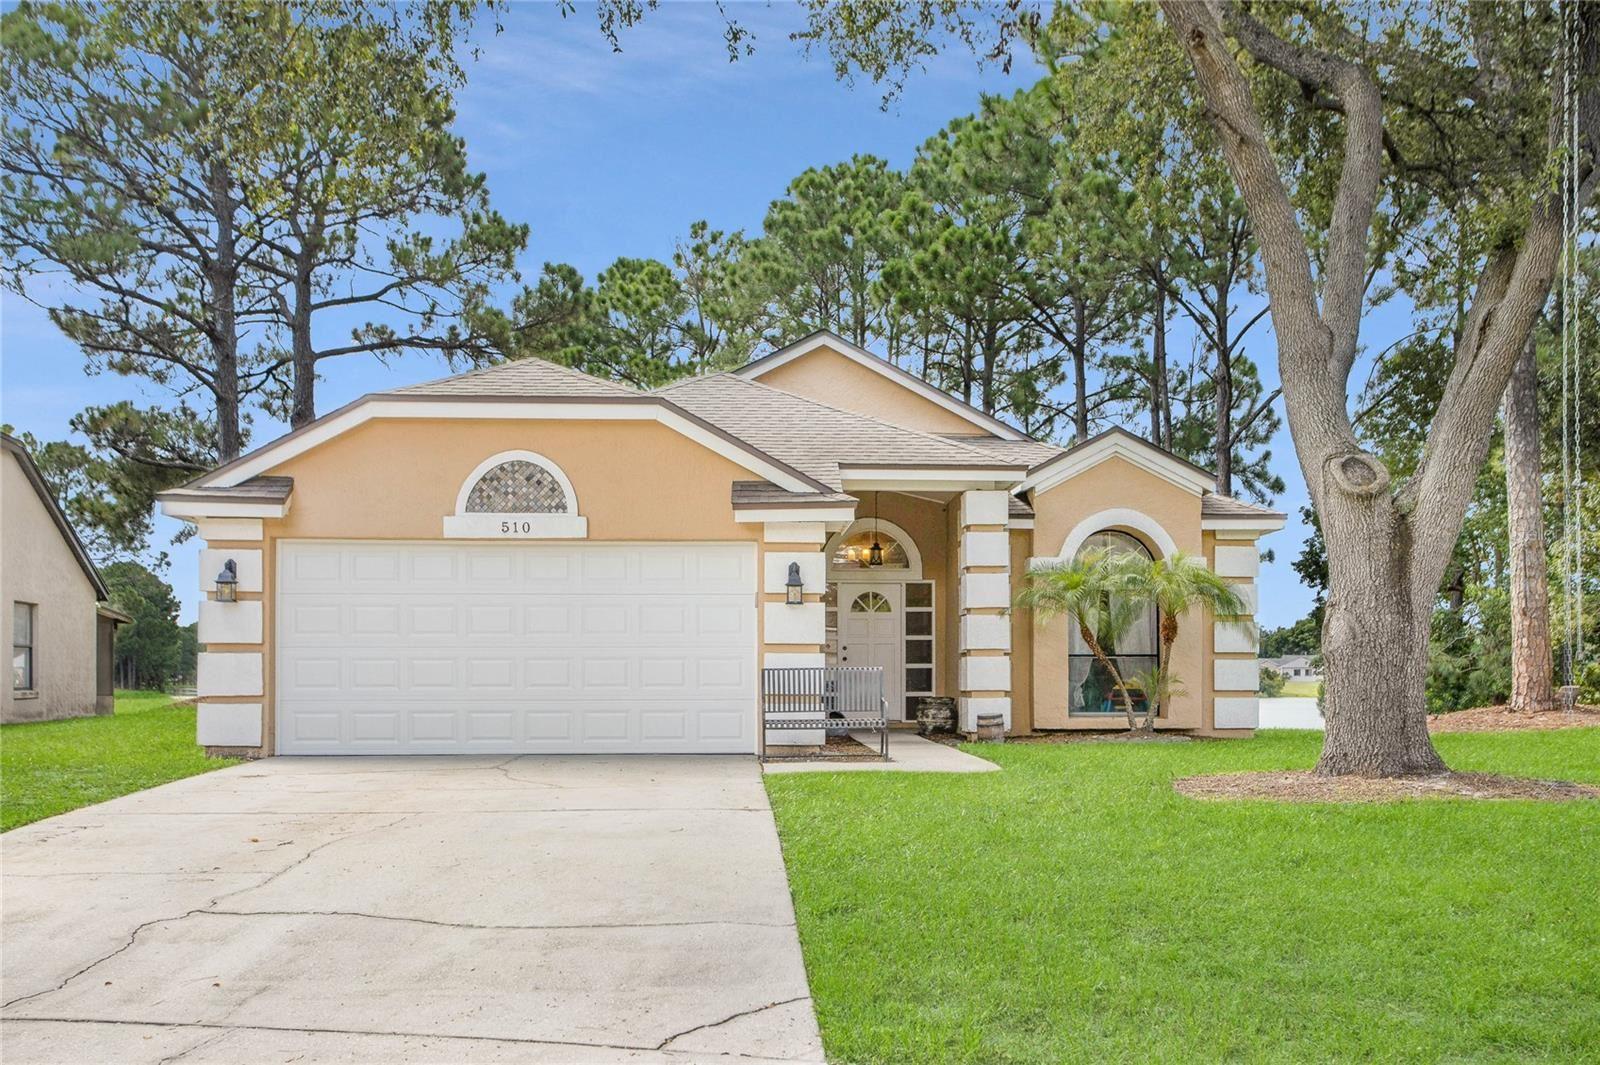 510 HUXFORD COURT, Lake Mary, FL 32746 - MLS#: O5960654